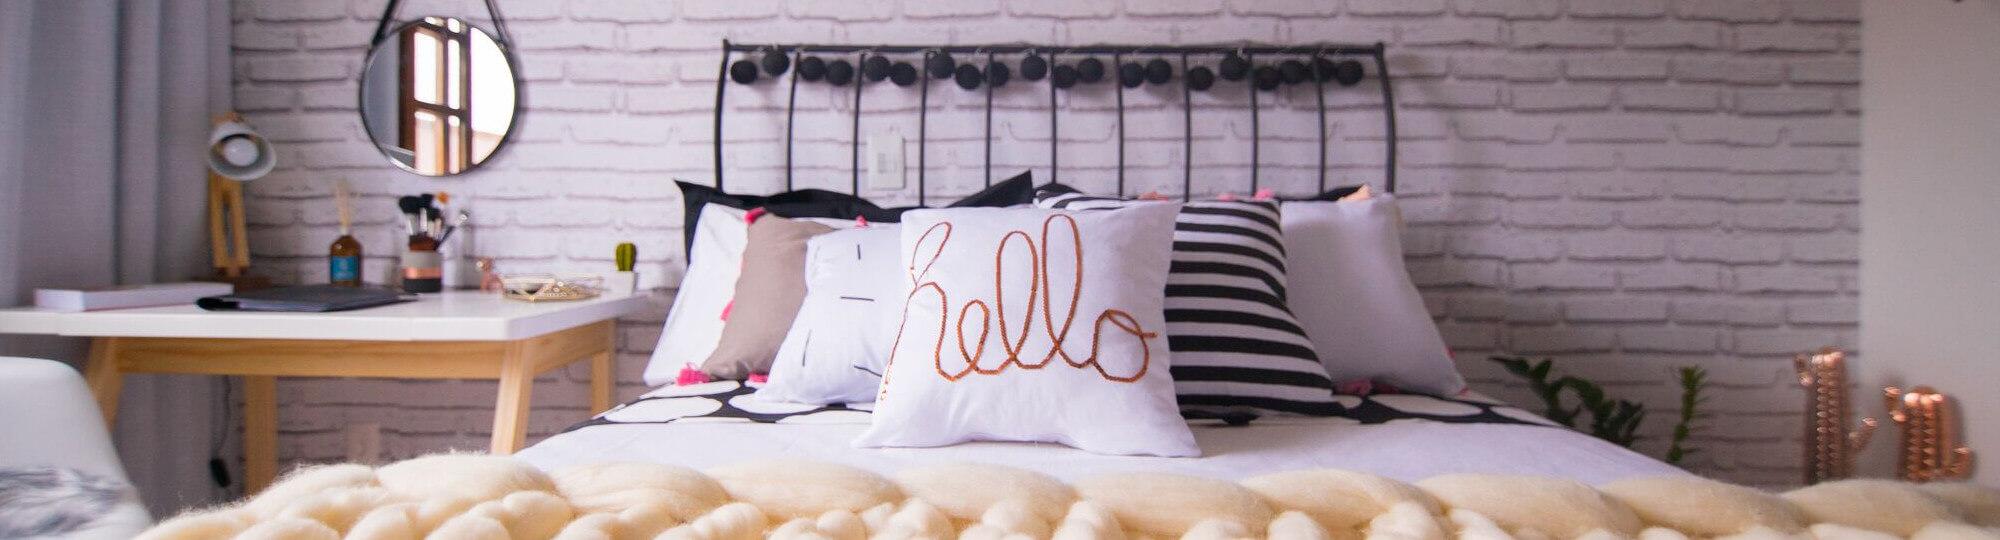 Ofertas de camas de ferro